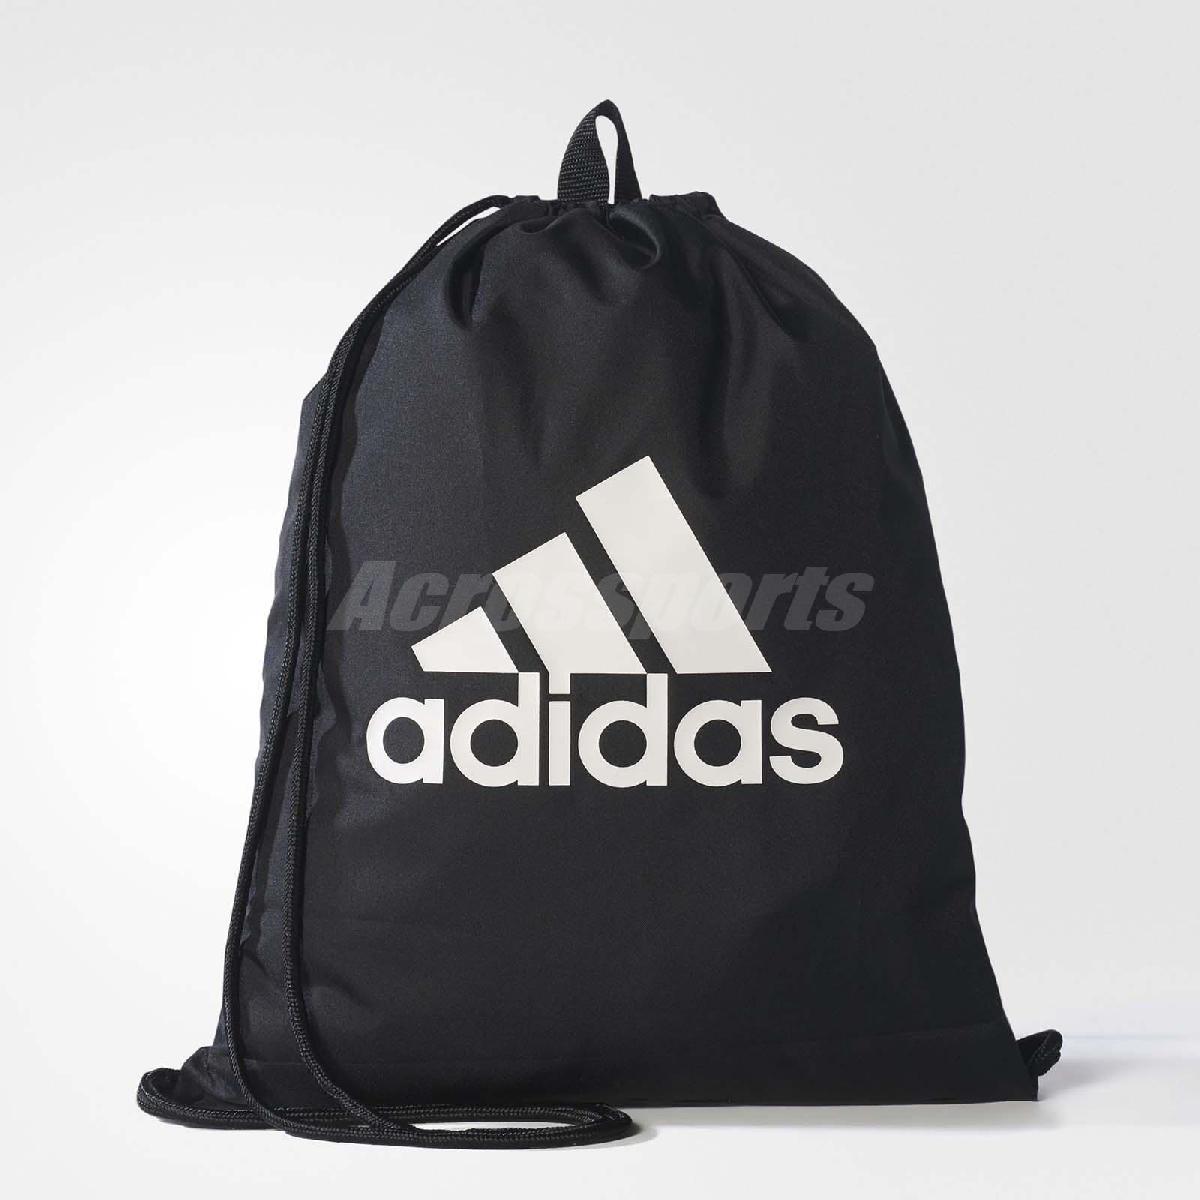 adidas 束口袋 PER LOGO GYM BAG 男女款 經典款 三條線 雙肩背 後背包 黑白 【PUMP306】 BR5051